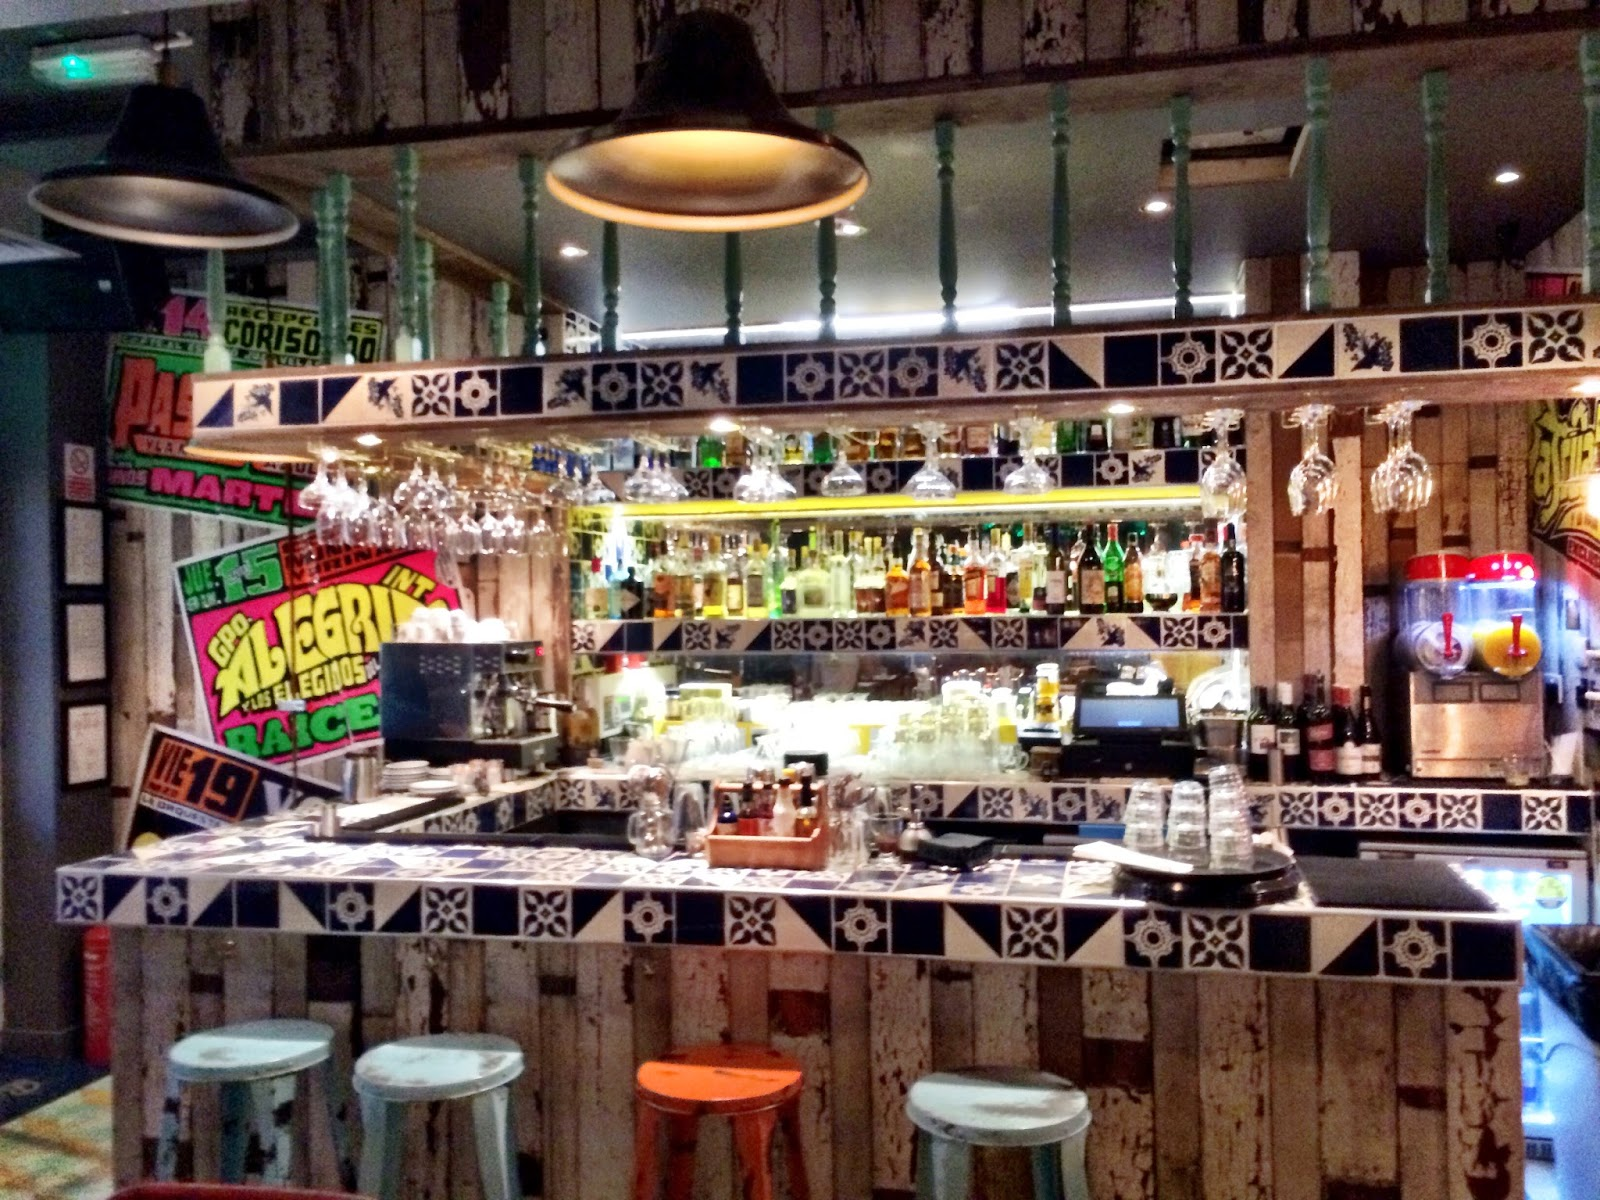 Se 241 Or Ceviche A Taste Of Peru In London Part 1 Simon